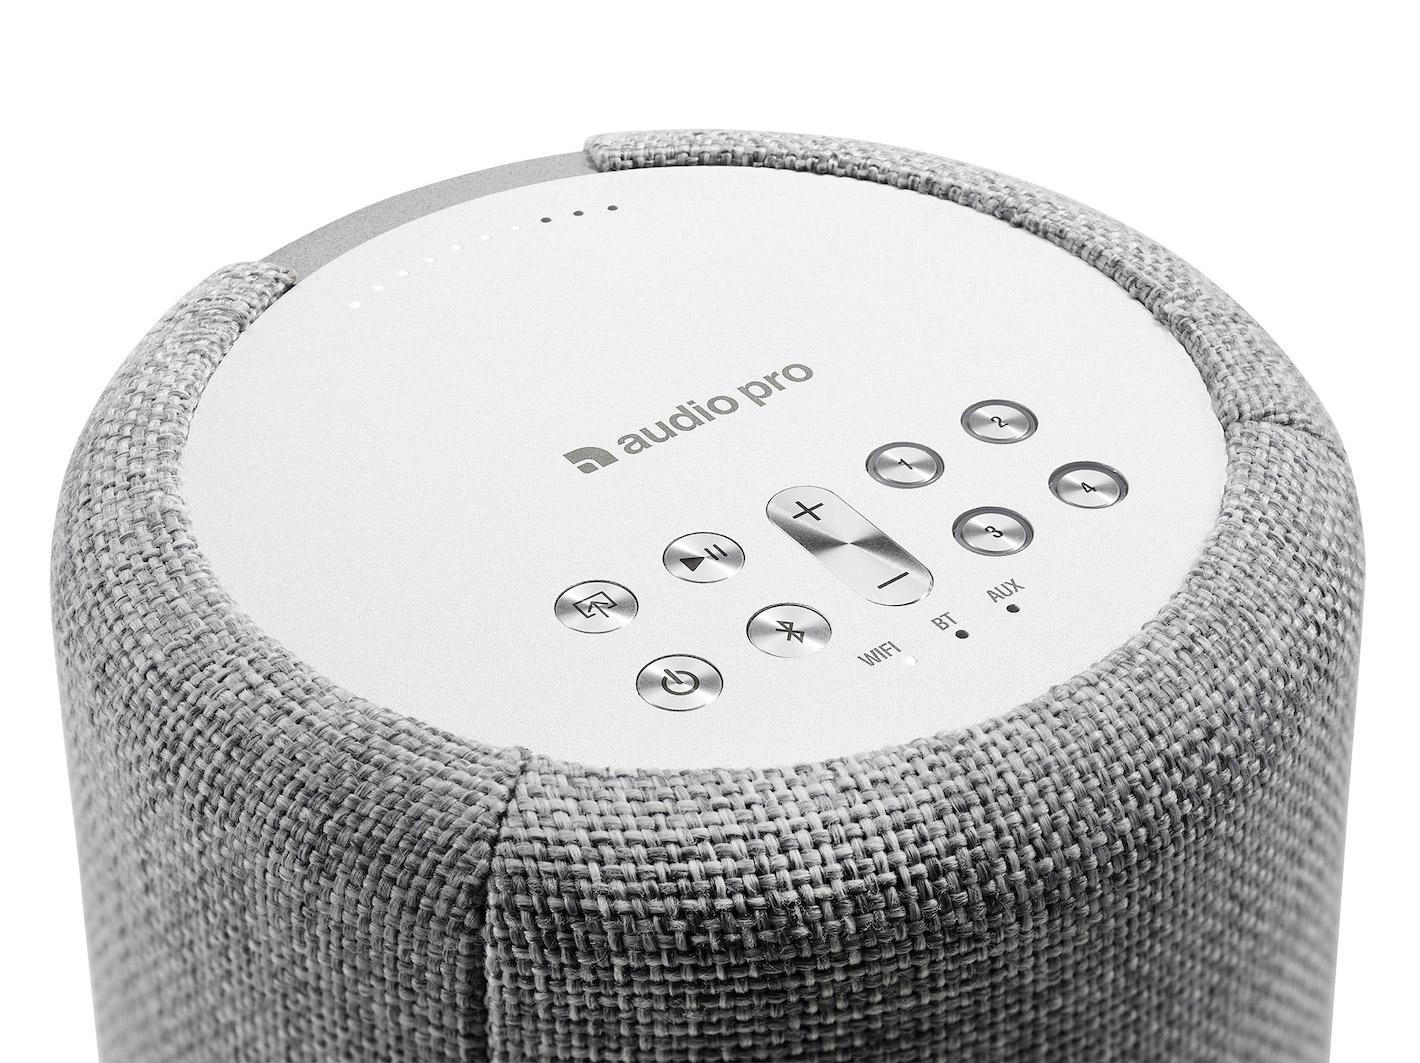 wireless-multiroom-speaker-A10-lightgray-detail-works-with-alexa-AudioPro